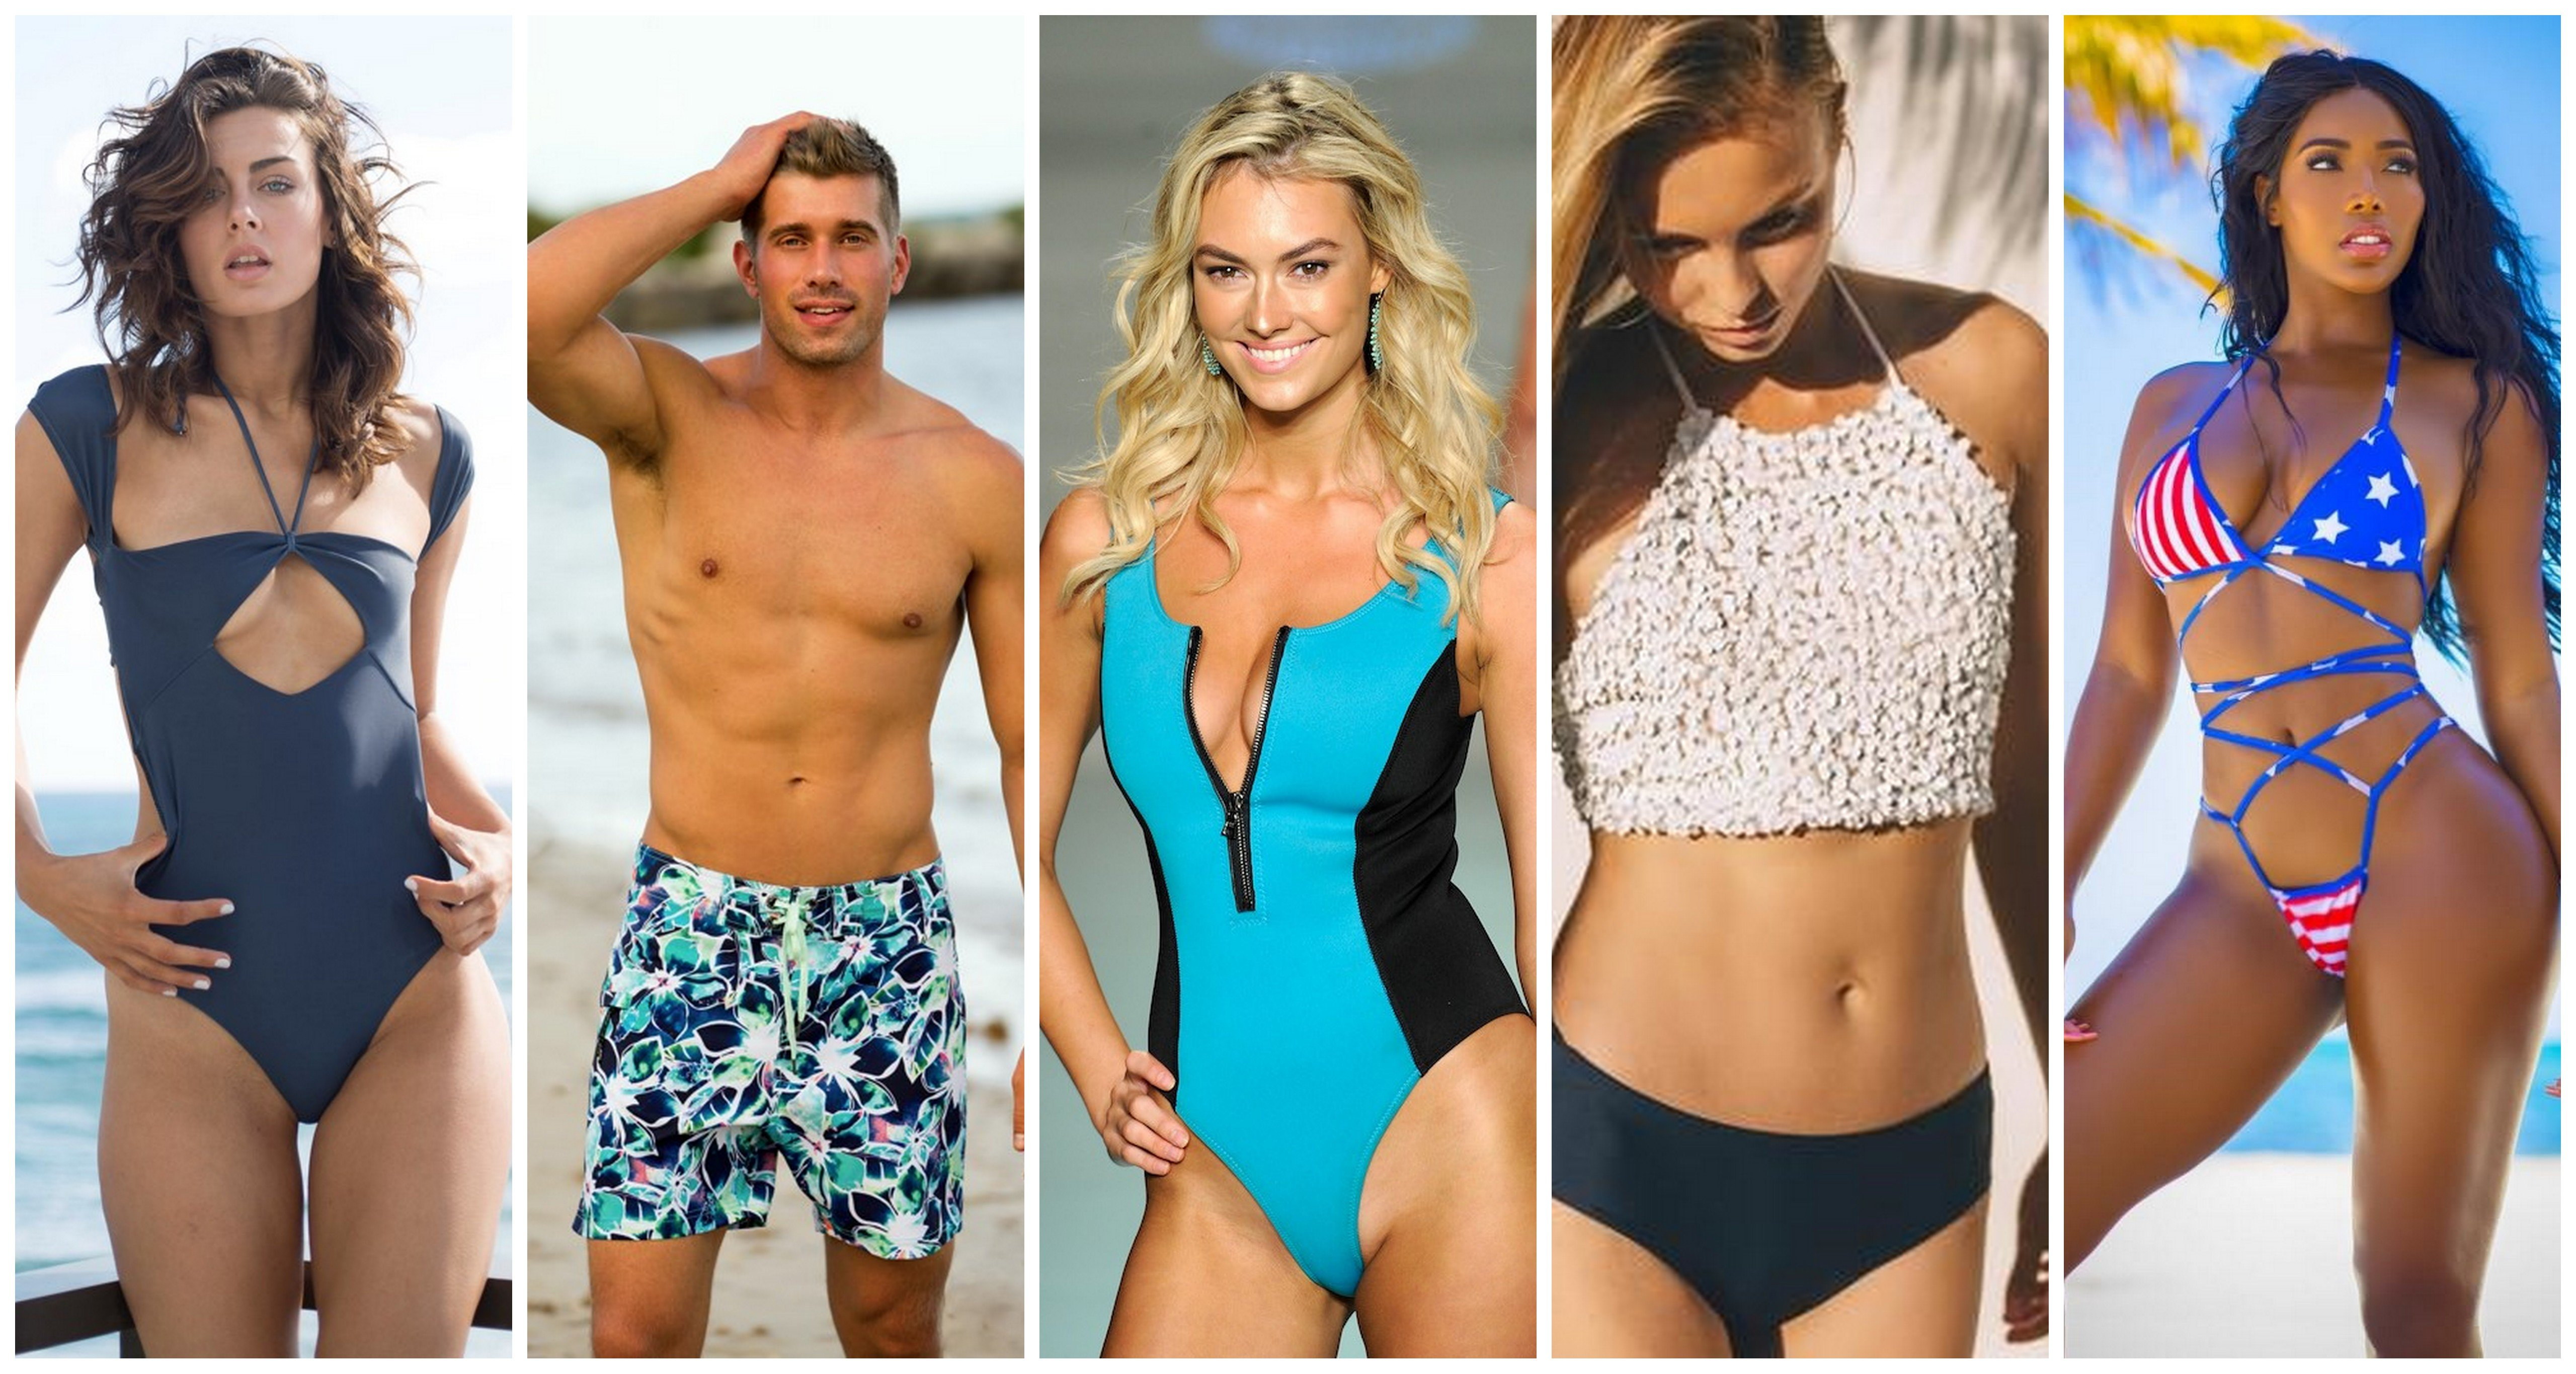 Planet Fashion Presents Swim Weekend Miami 2017 at SLS South Beach and Hide Beach